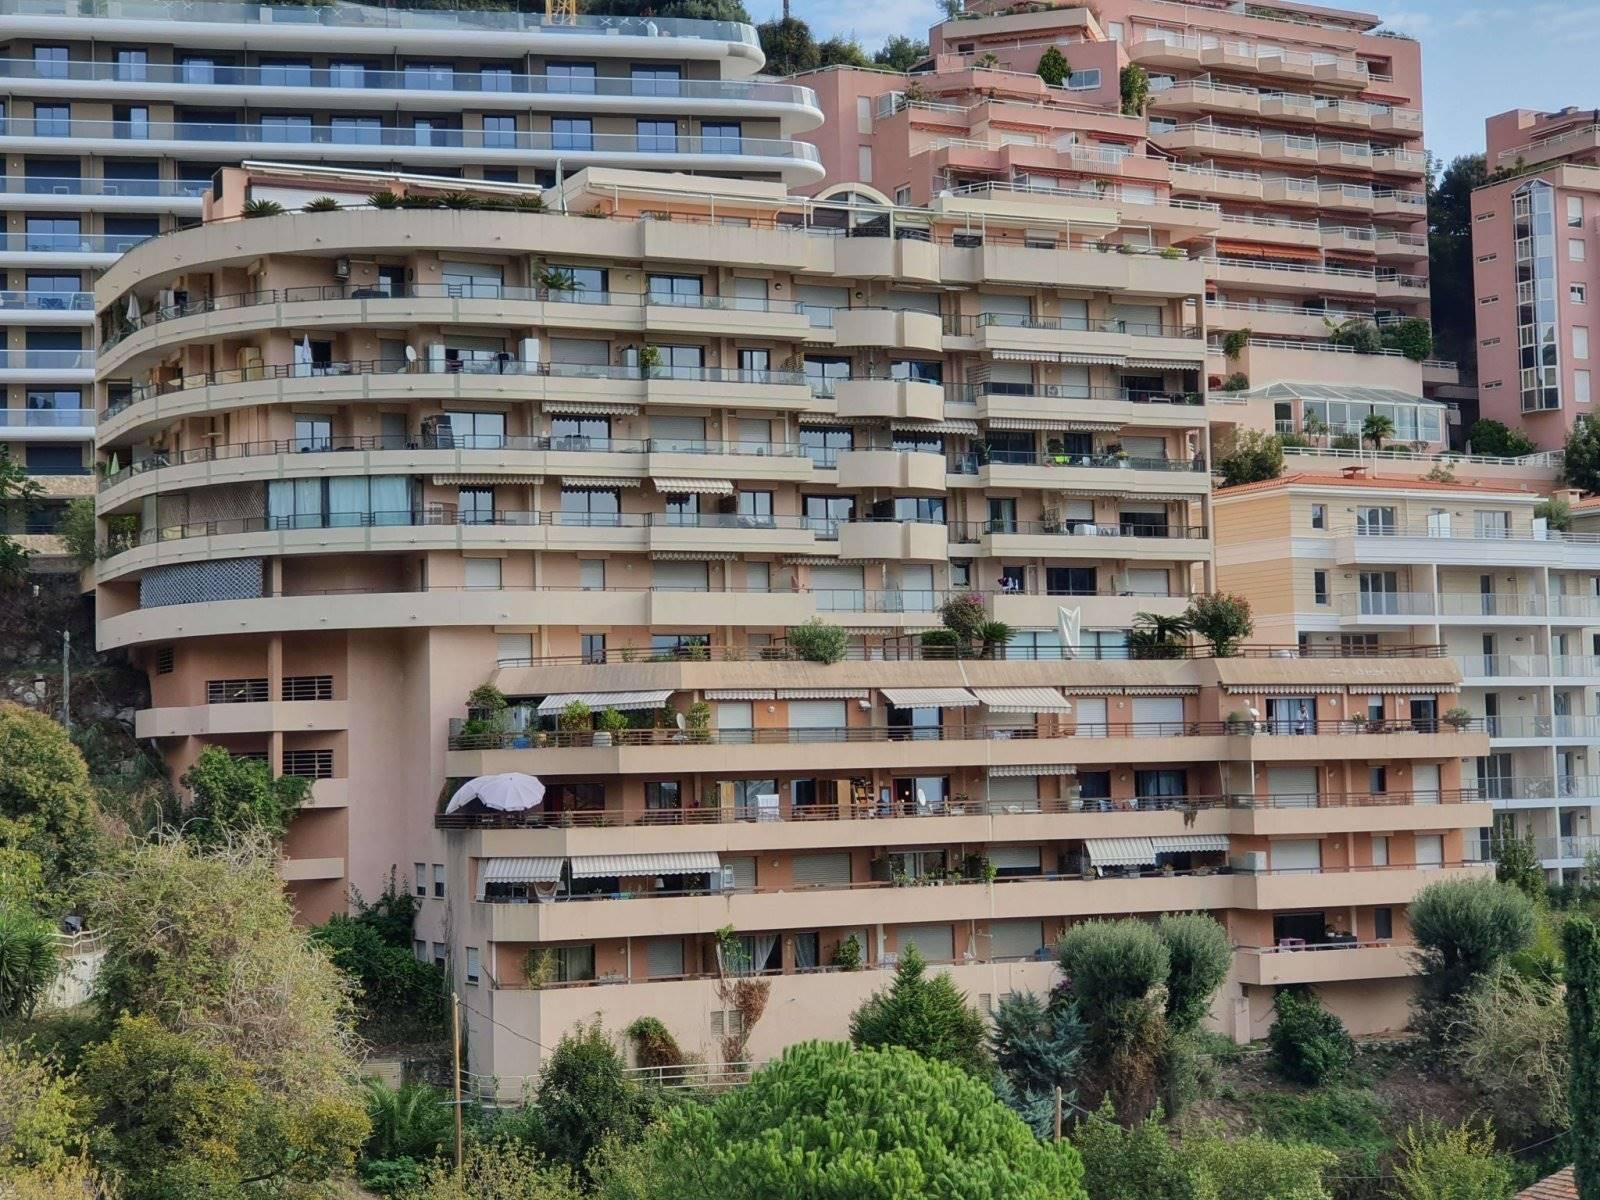 Vai alla scheda: Appartamento Vendita - Beausoleil (Alpes-Maritimes) - Codice -21 - MENTON 3